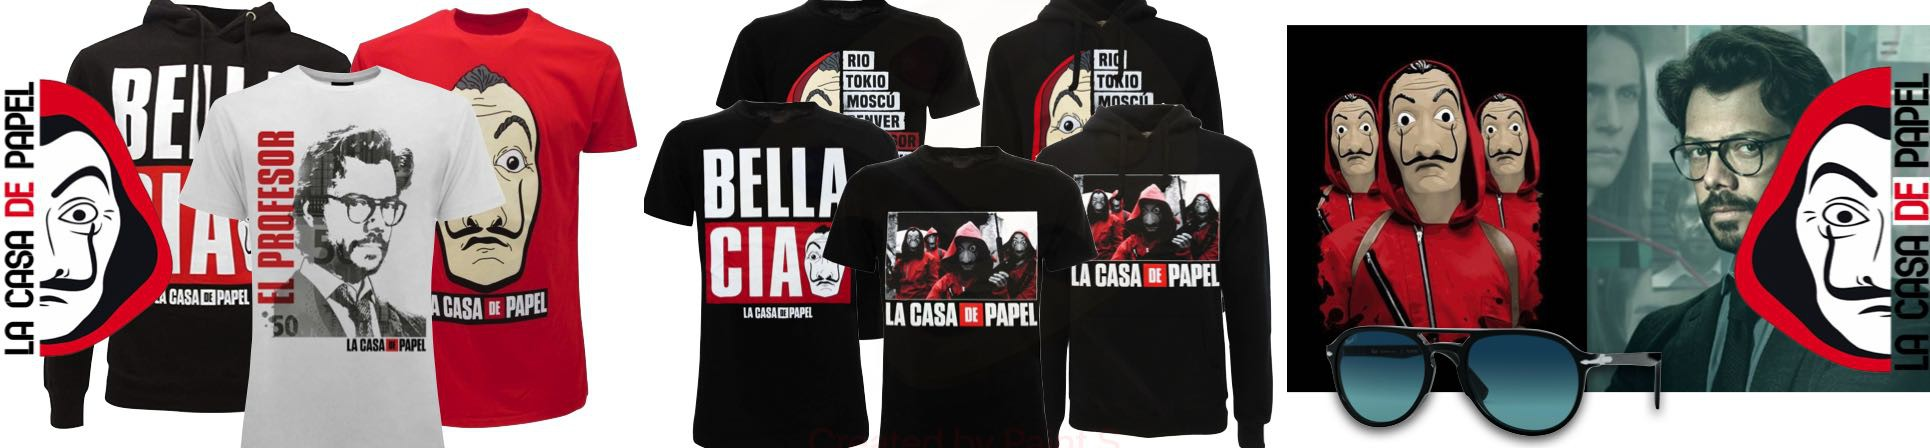 vendita online t-shirt series